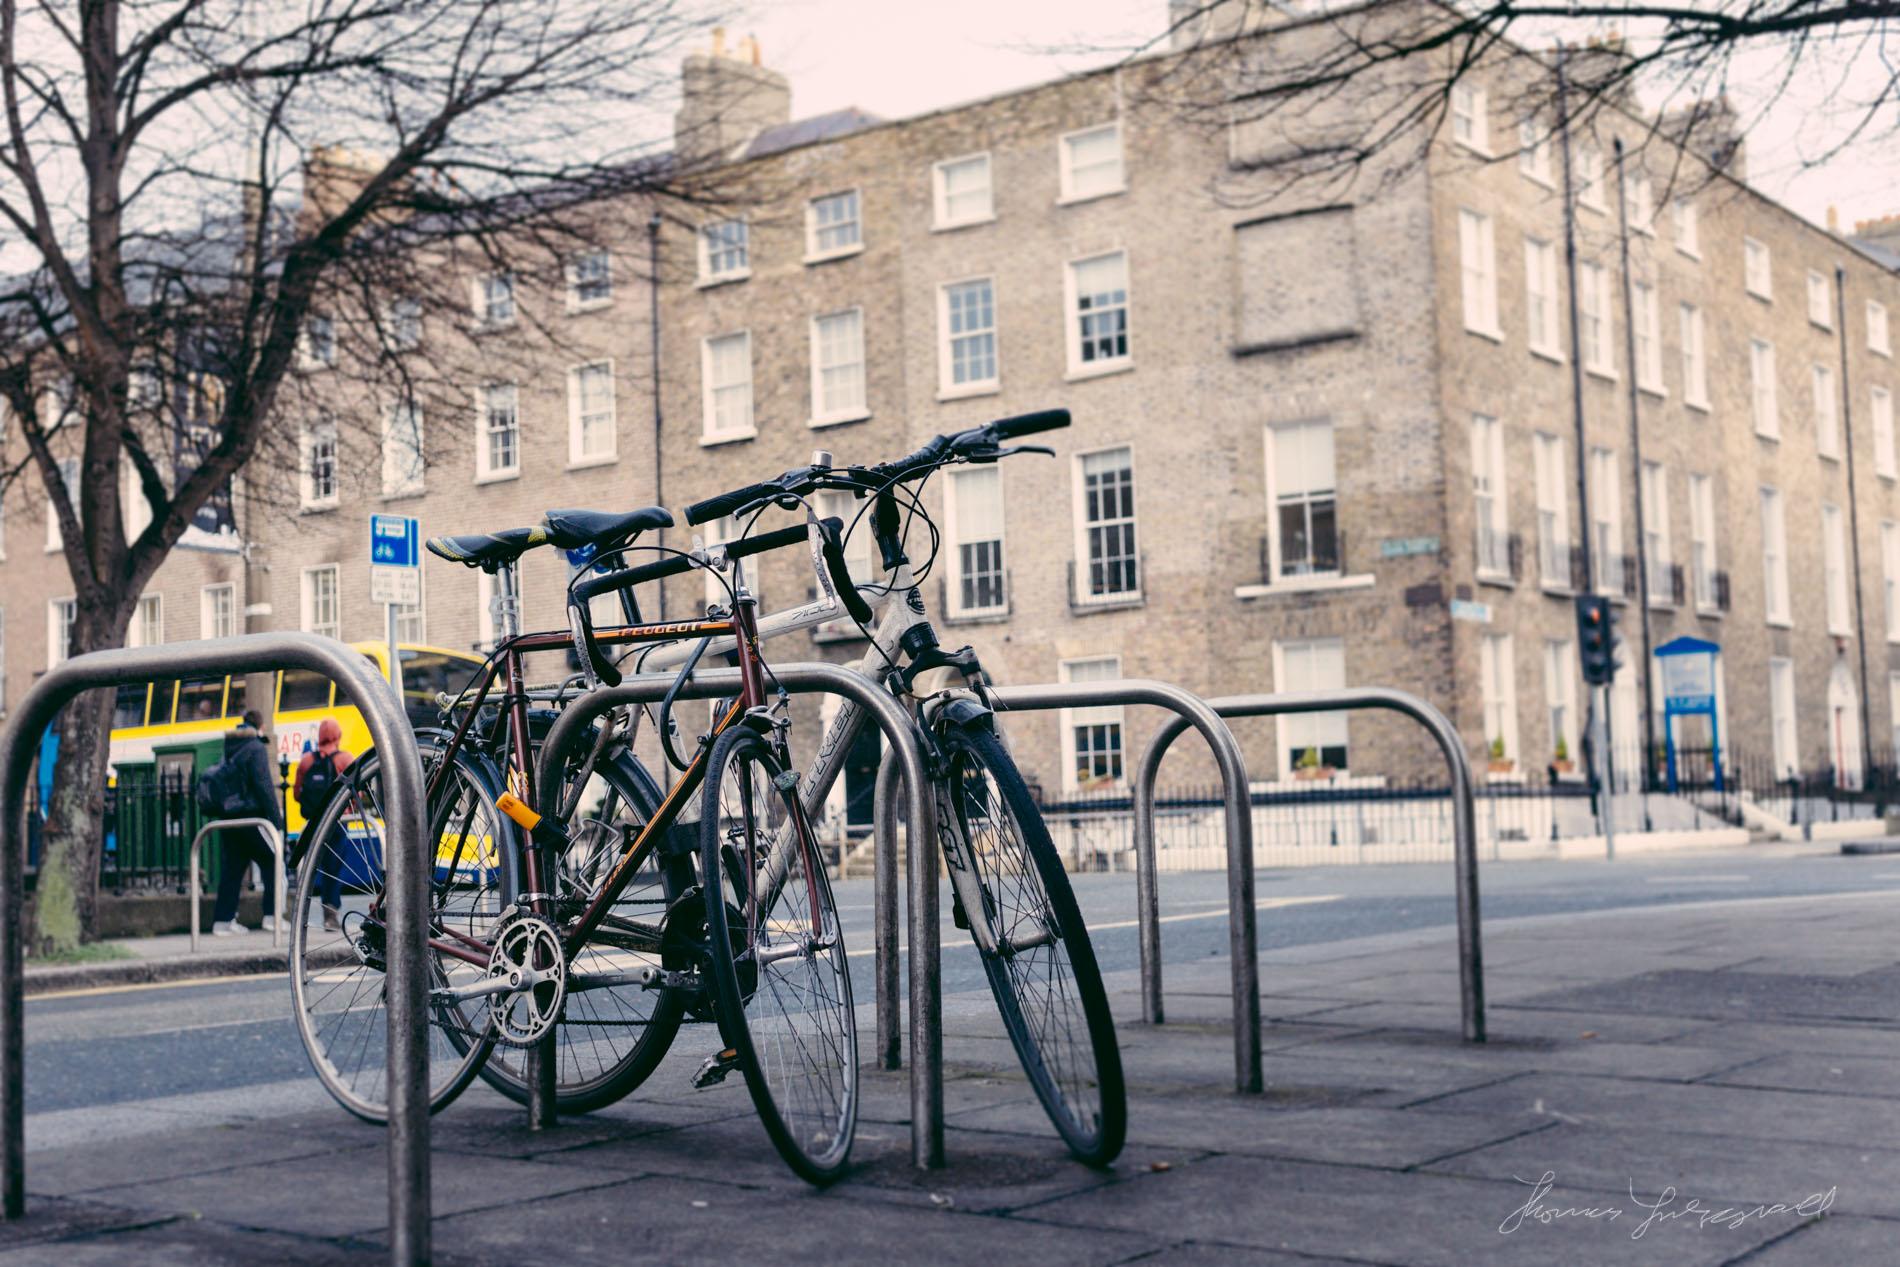 Bikes parked in Dublin City